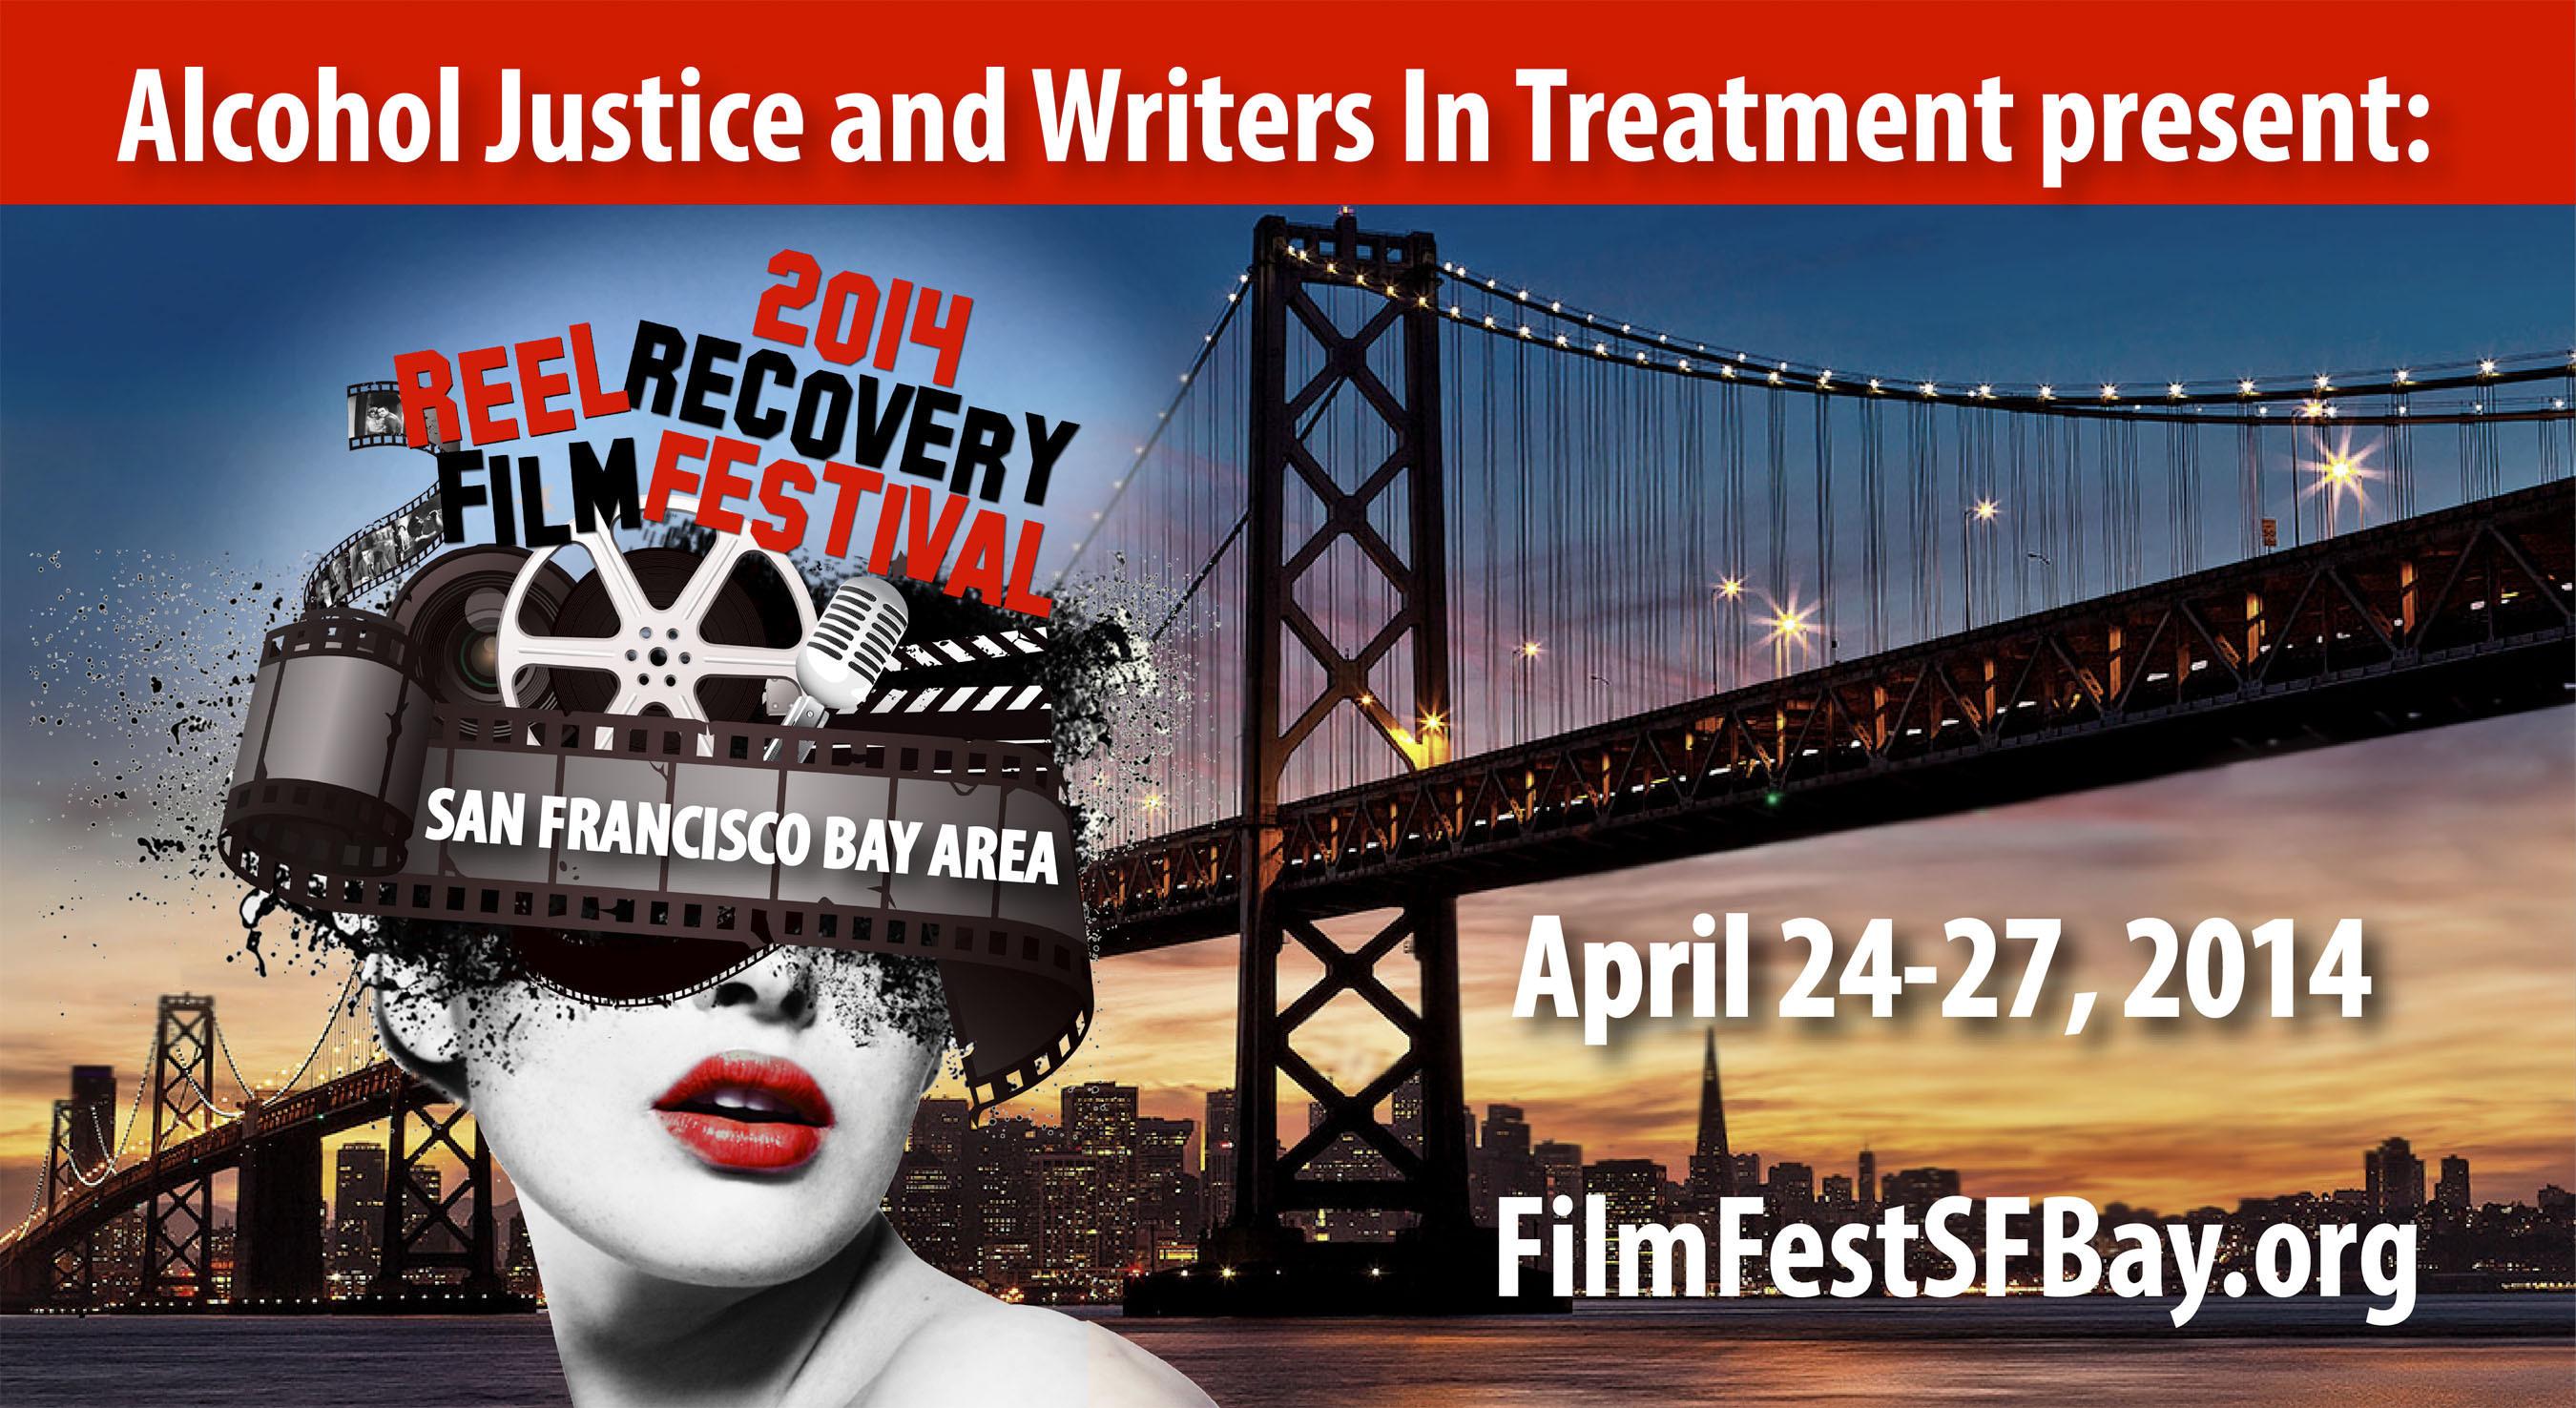 New Film Event Scheduled for San Francisco Bay Area. (PRNewsFoto/Alcohol Justice) (PRNewsFoto/ALCOHOL JUSTICE)